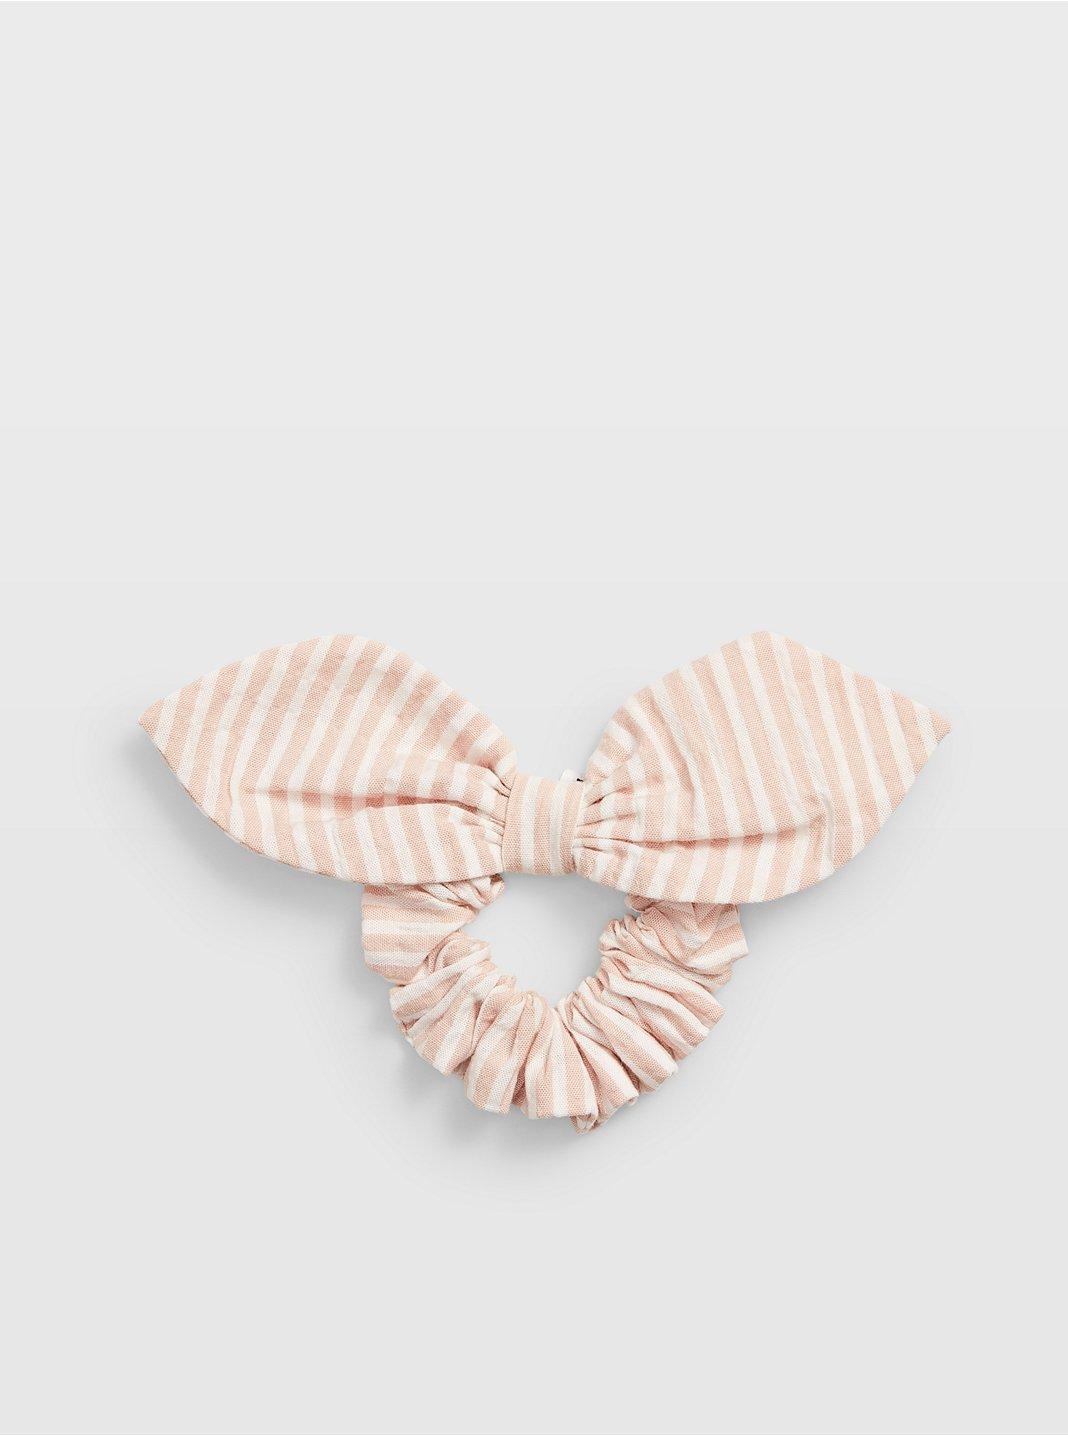 Pibby Scrunchie